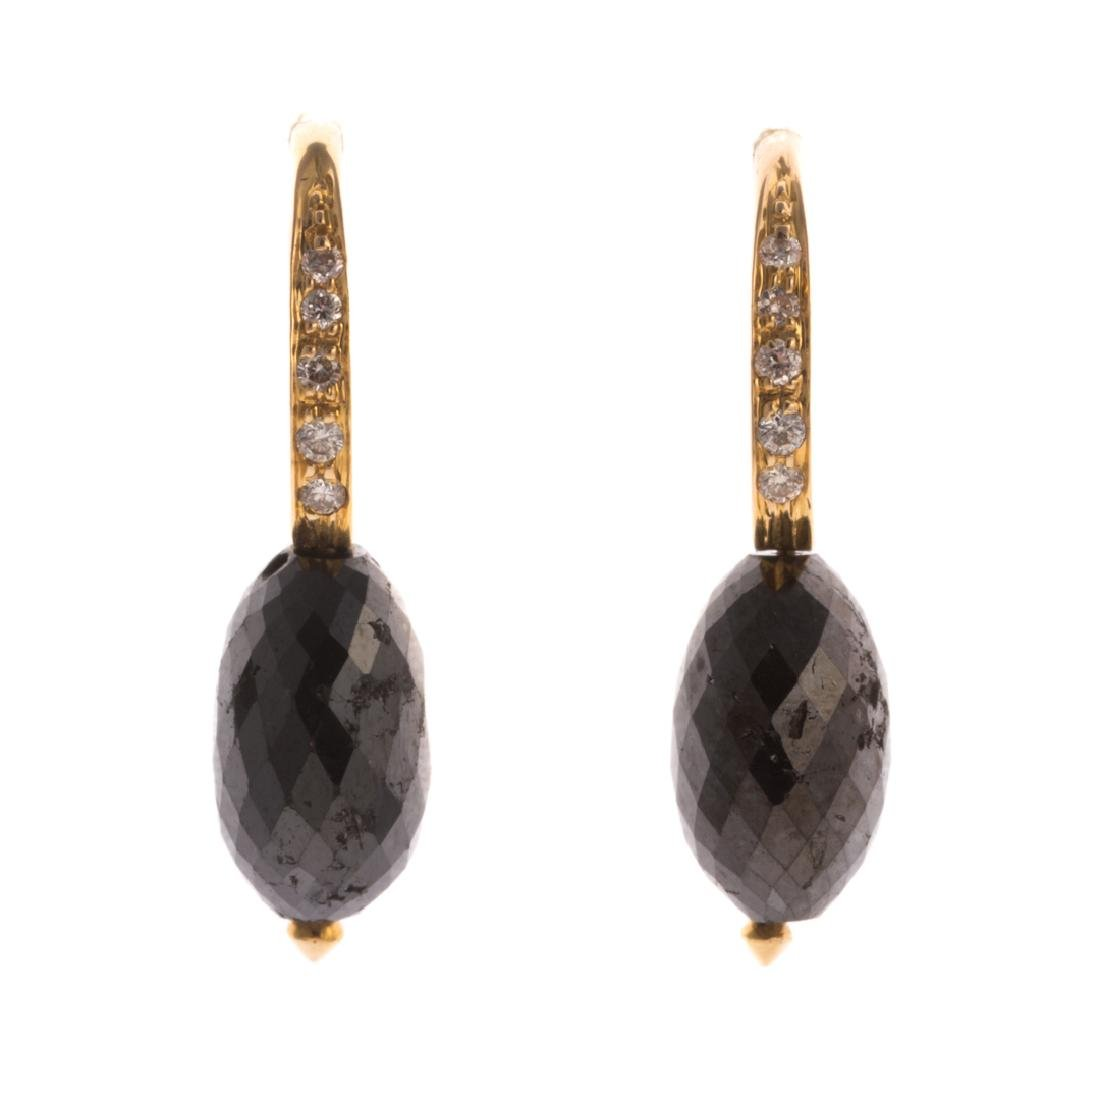 A Pair of Lady's Black Diamond Earrings in 18K